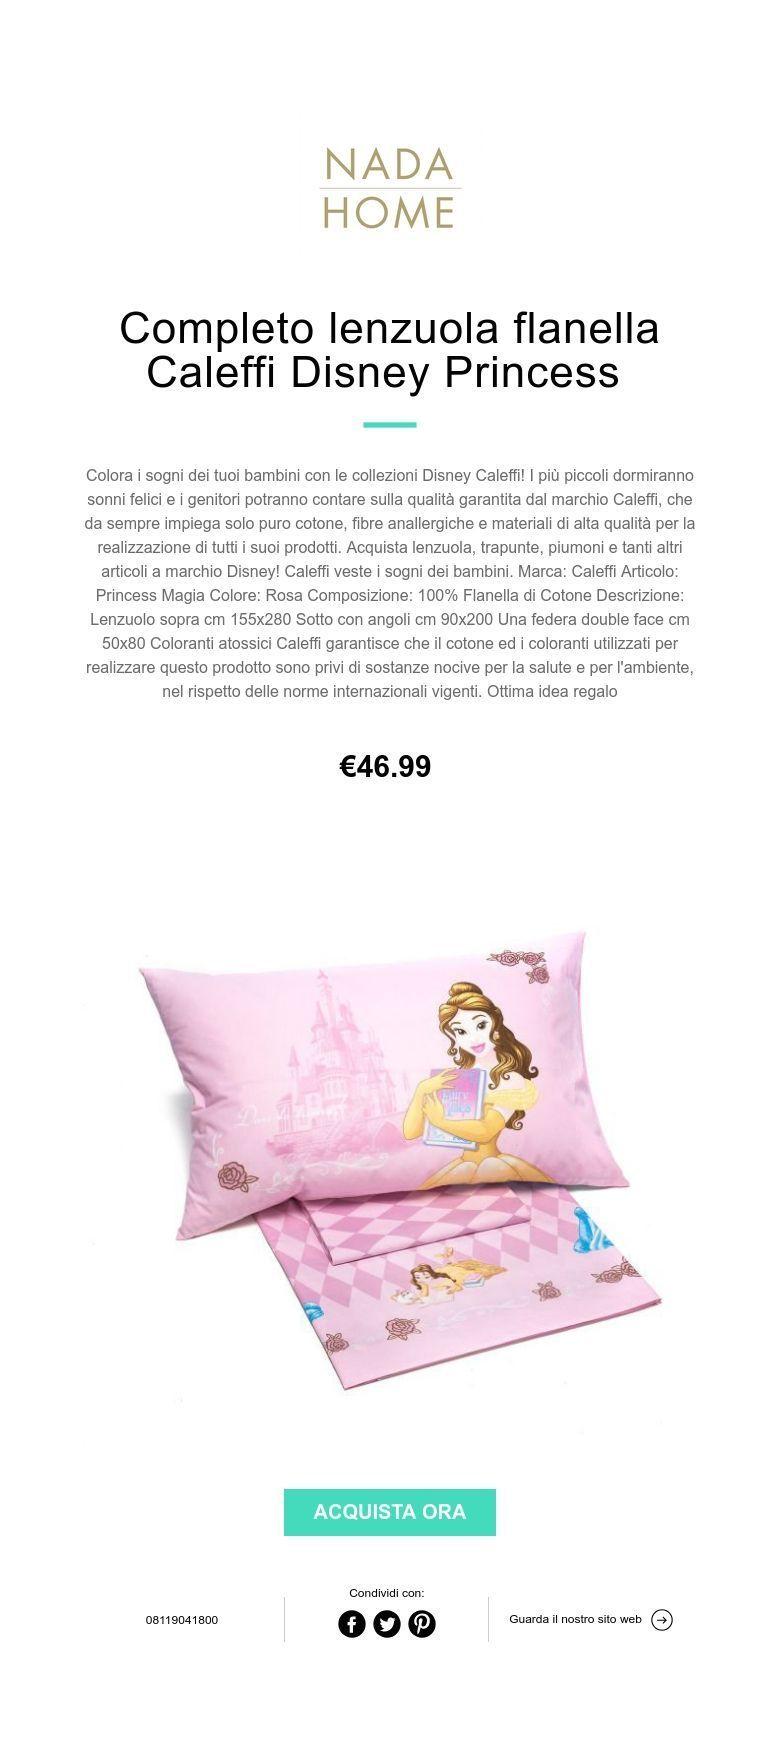 Lenzuola Flanella Disney Caleffi.Completo Lenzuola Flanella Caleffi Disney Princess Biancheria